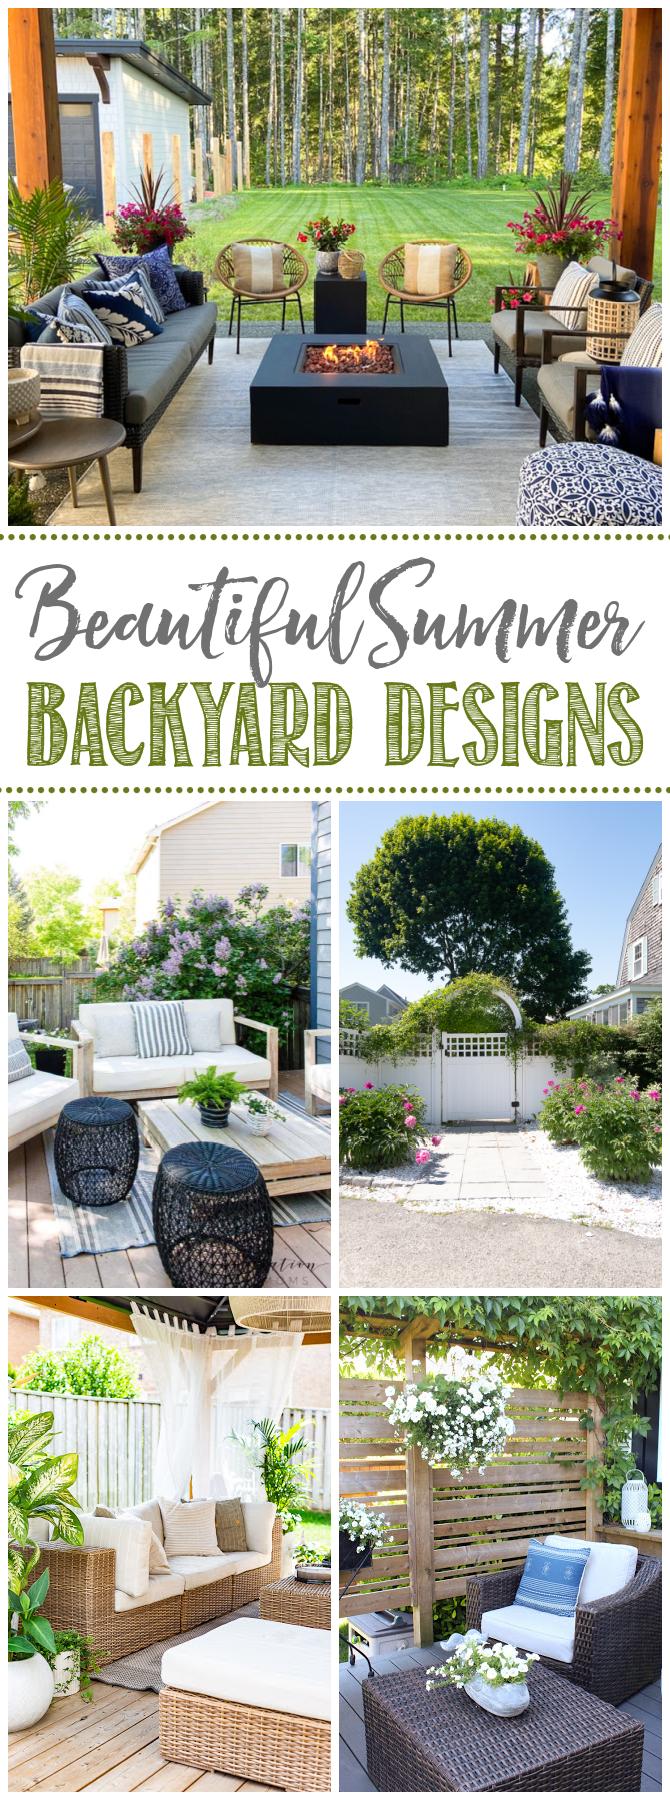 Collage of beautiful summer backyard design ideas.